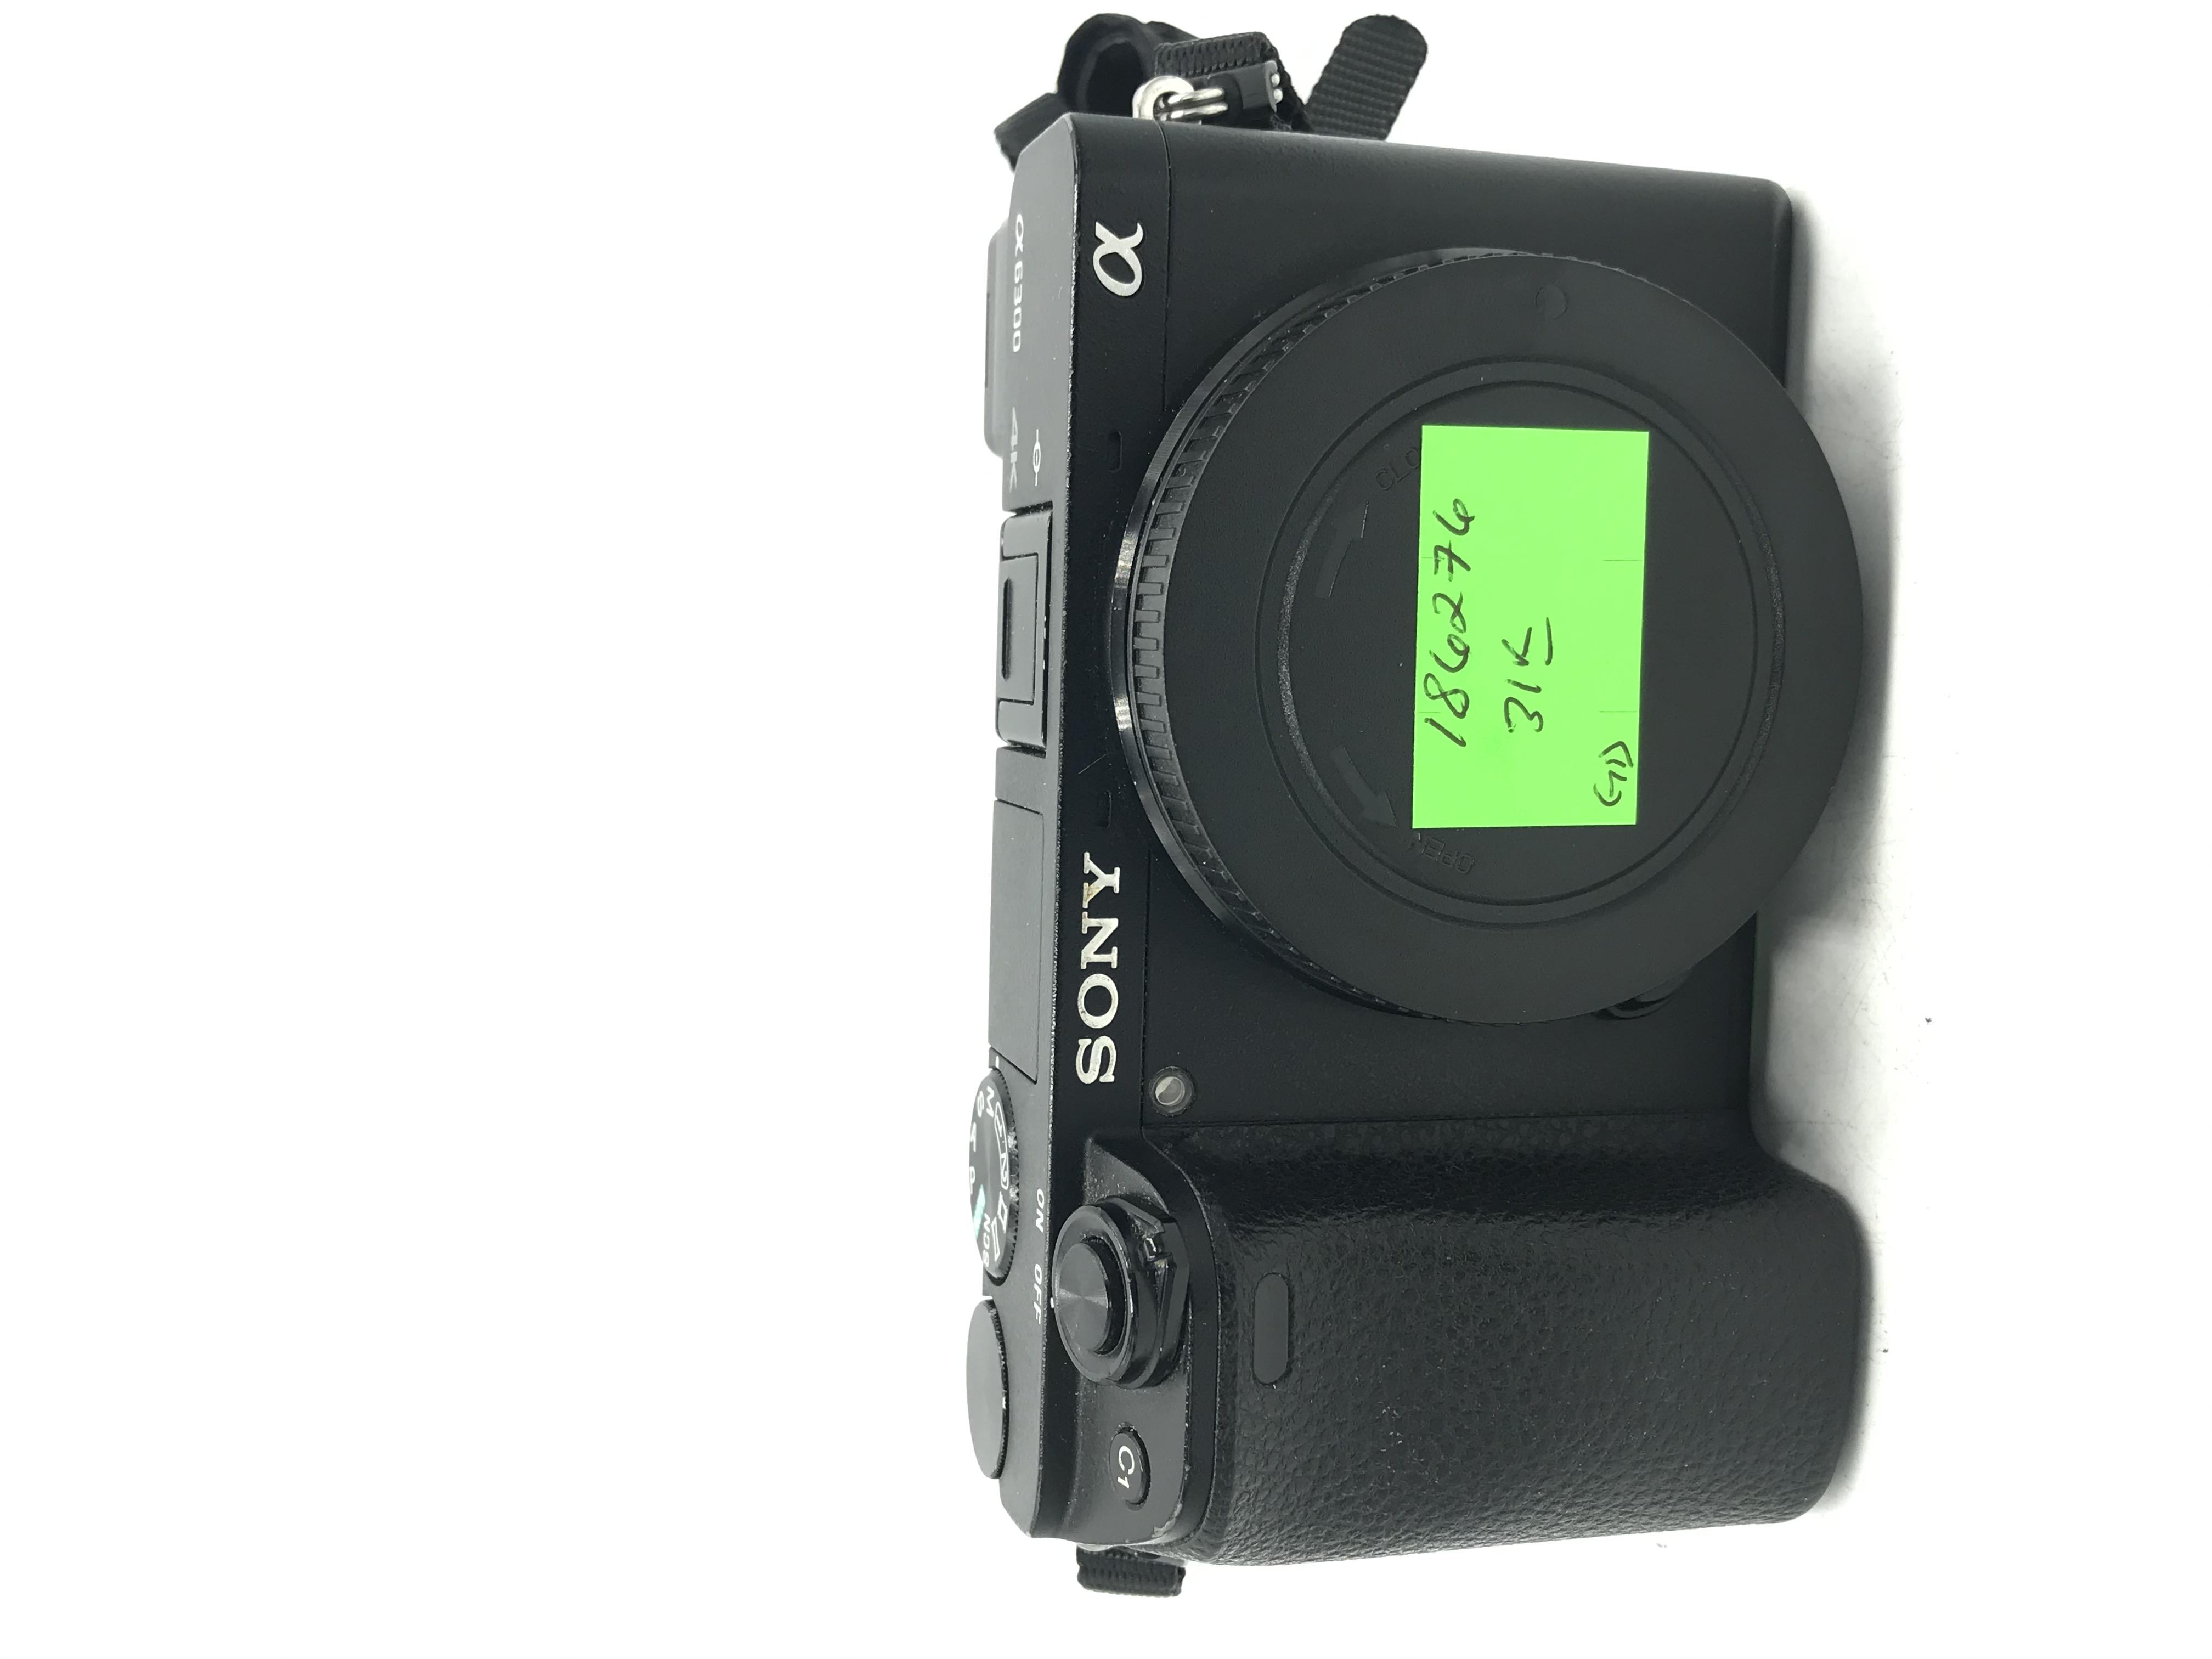 USED Sony a6300 Mirrorless Camera (Body)